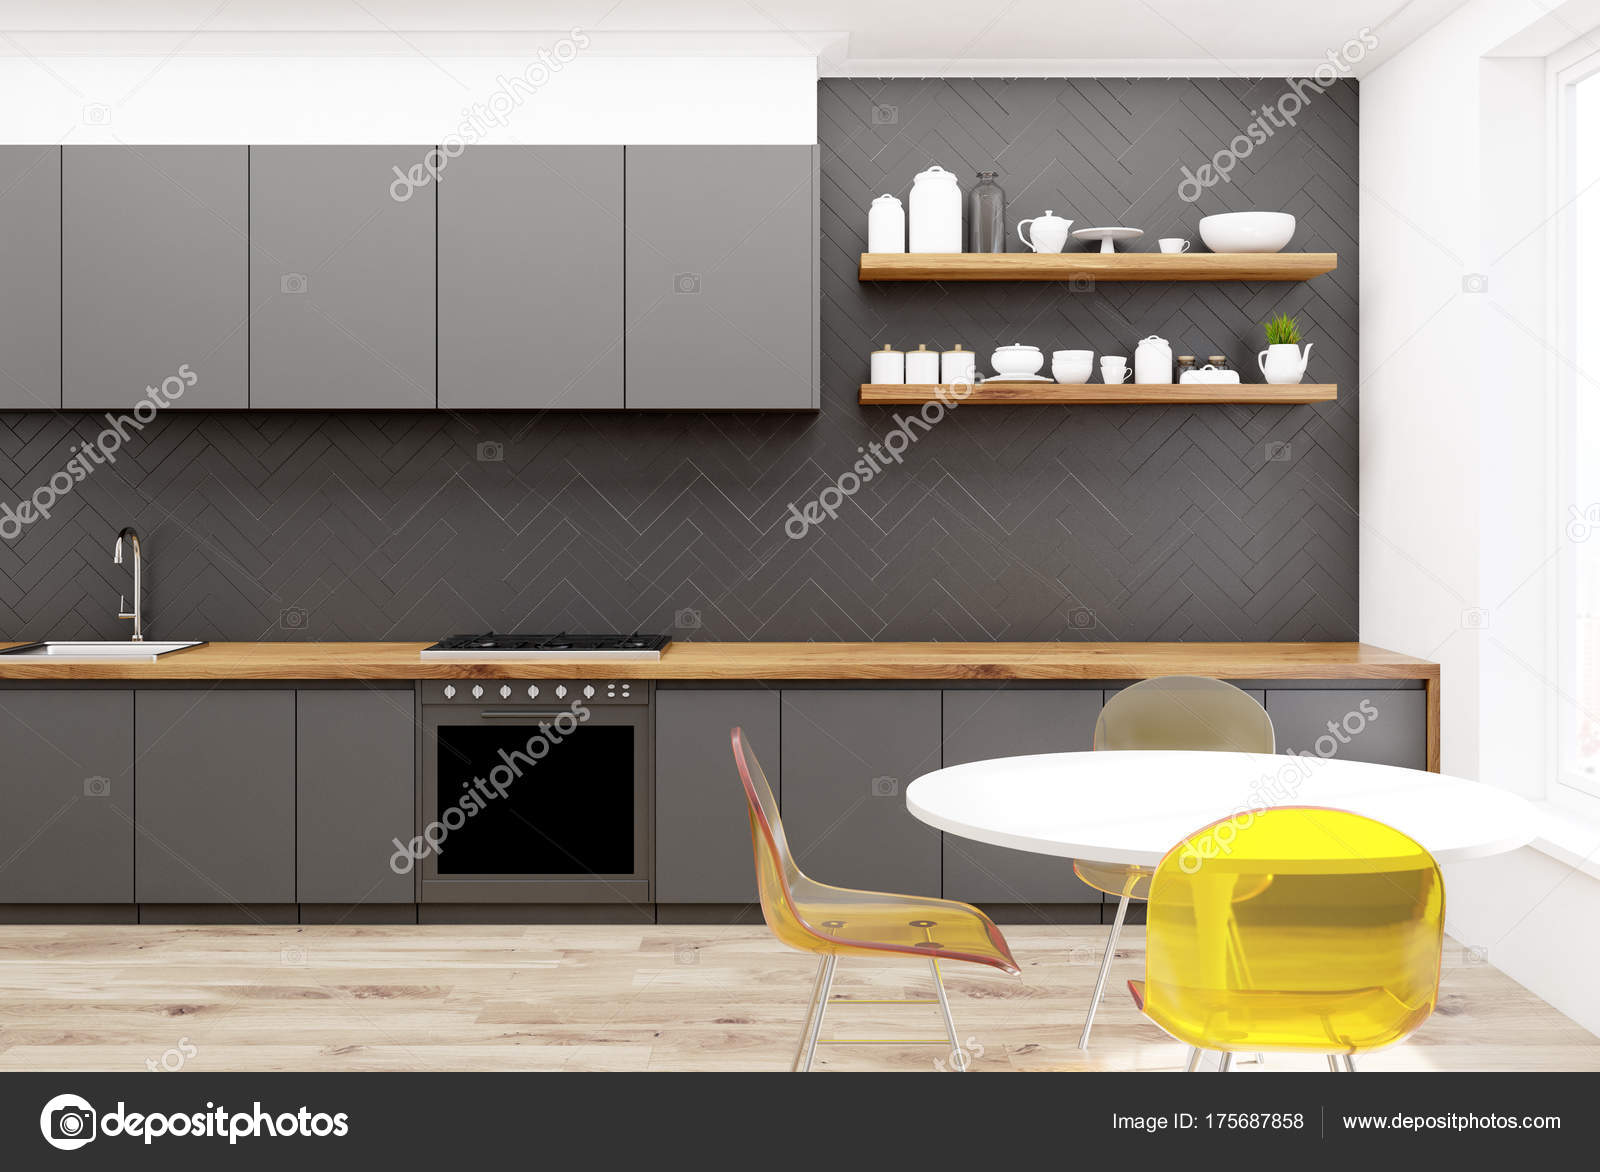 Sedie Da Cucina In Legno : Sedie da cucina in legno grigio giallo u foto stock